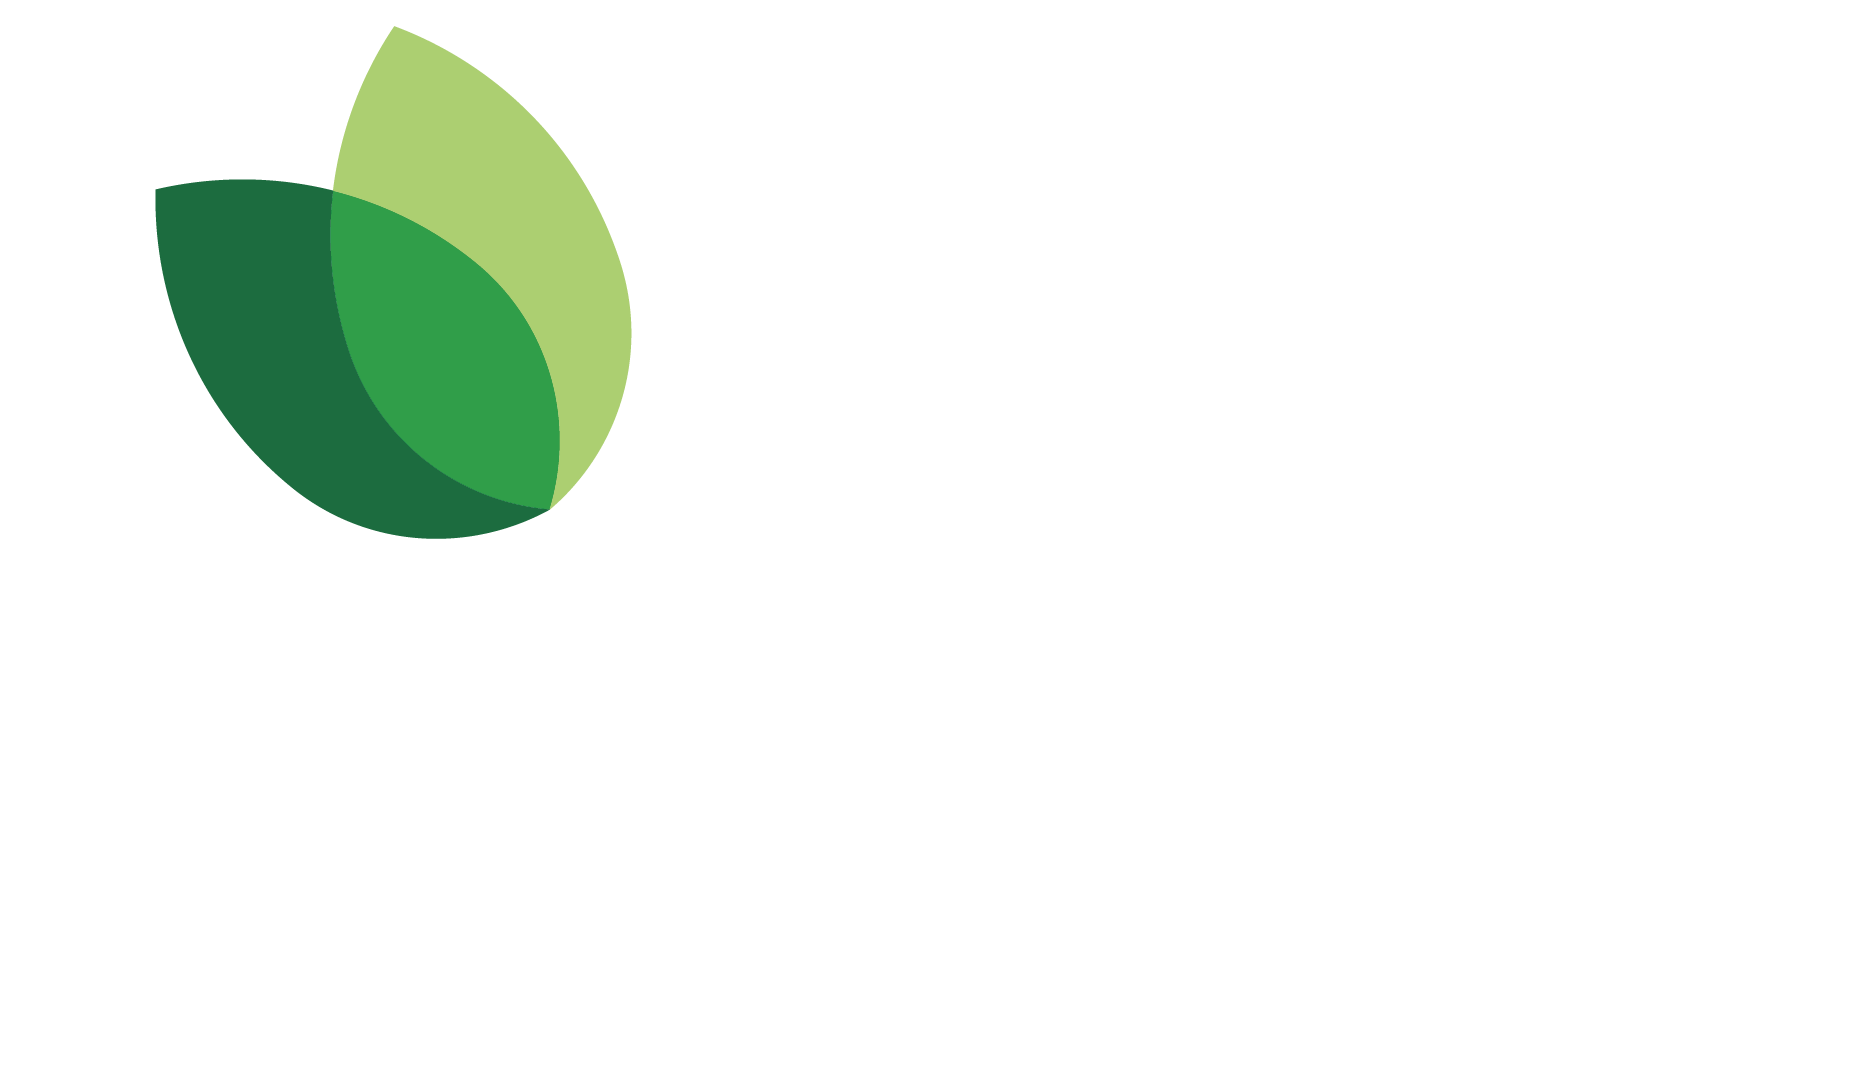 Logo beLeafing.com